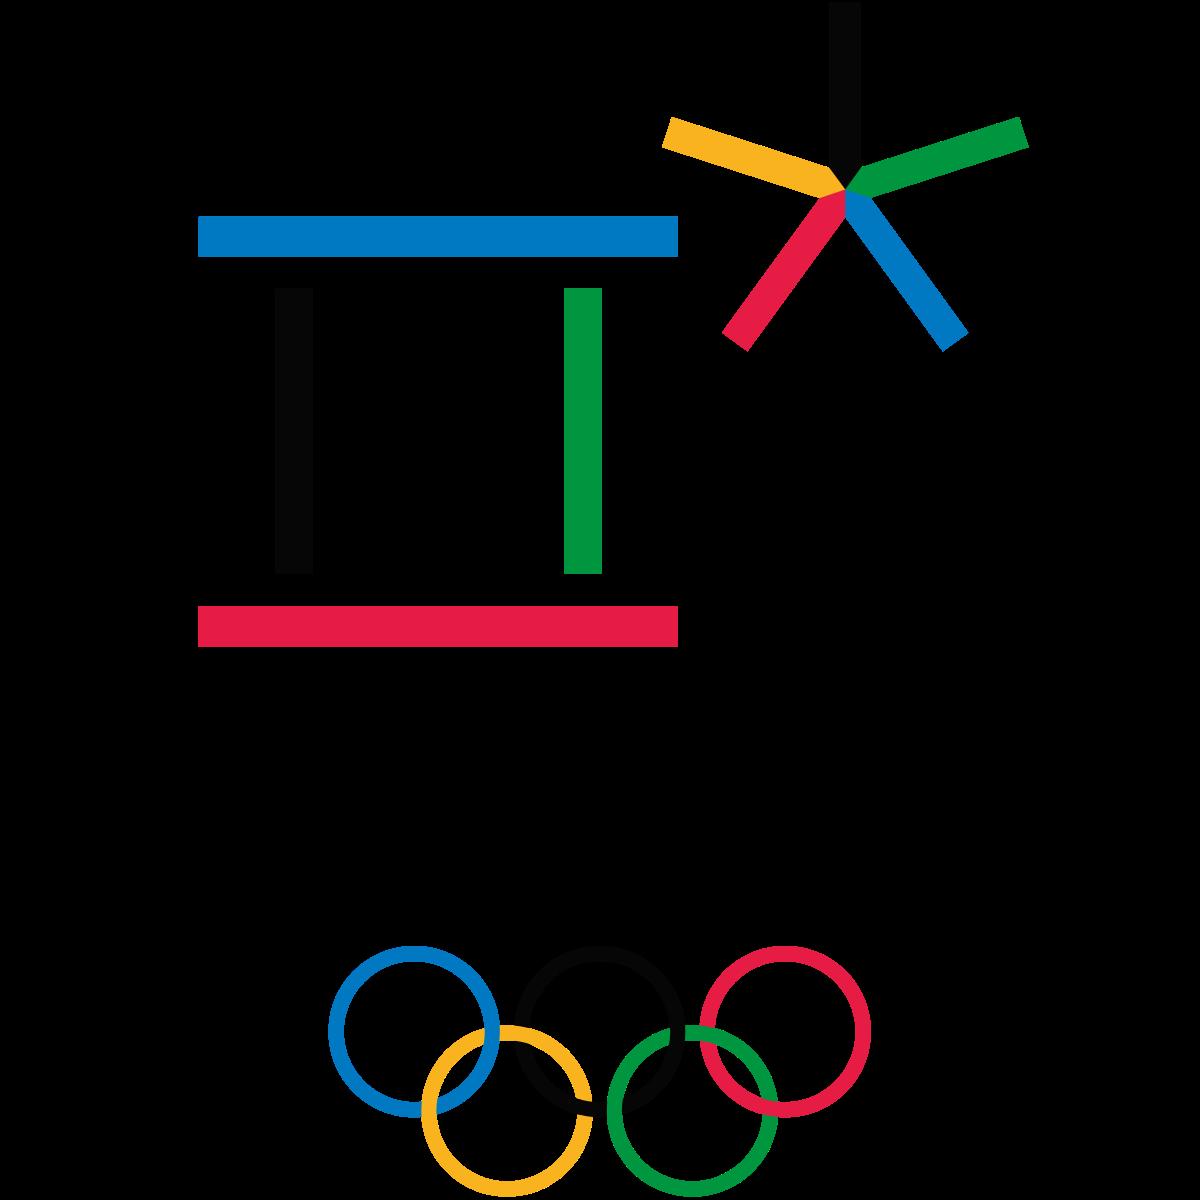 1200px-PyeongChang_2018_Winter_Olympics.